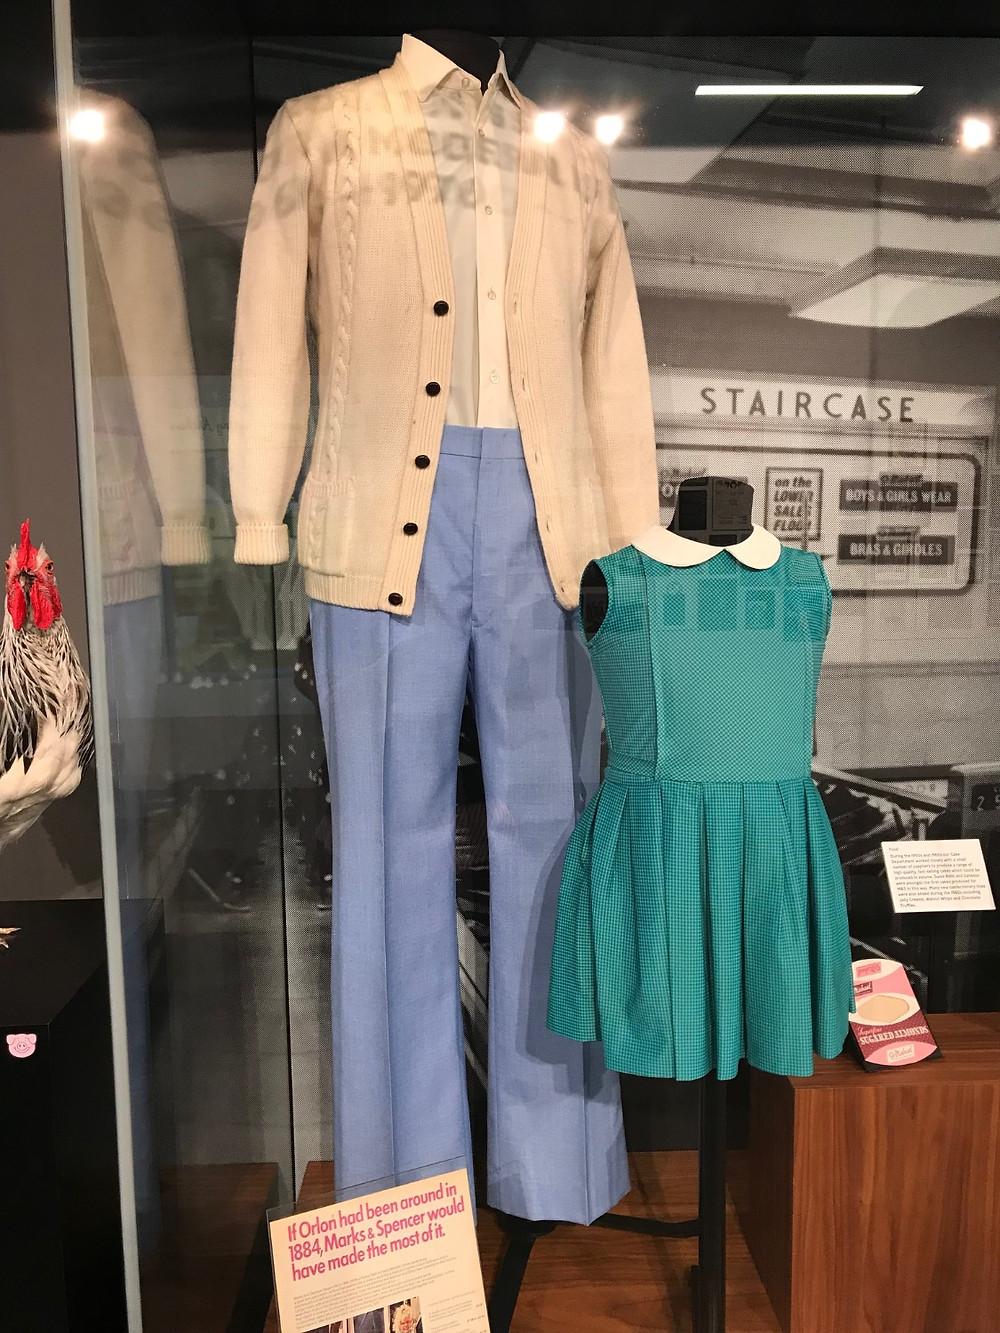 1970s menswear and childrenswear